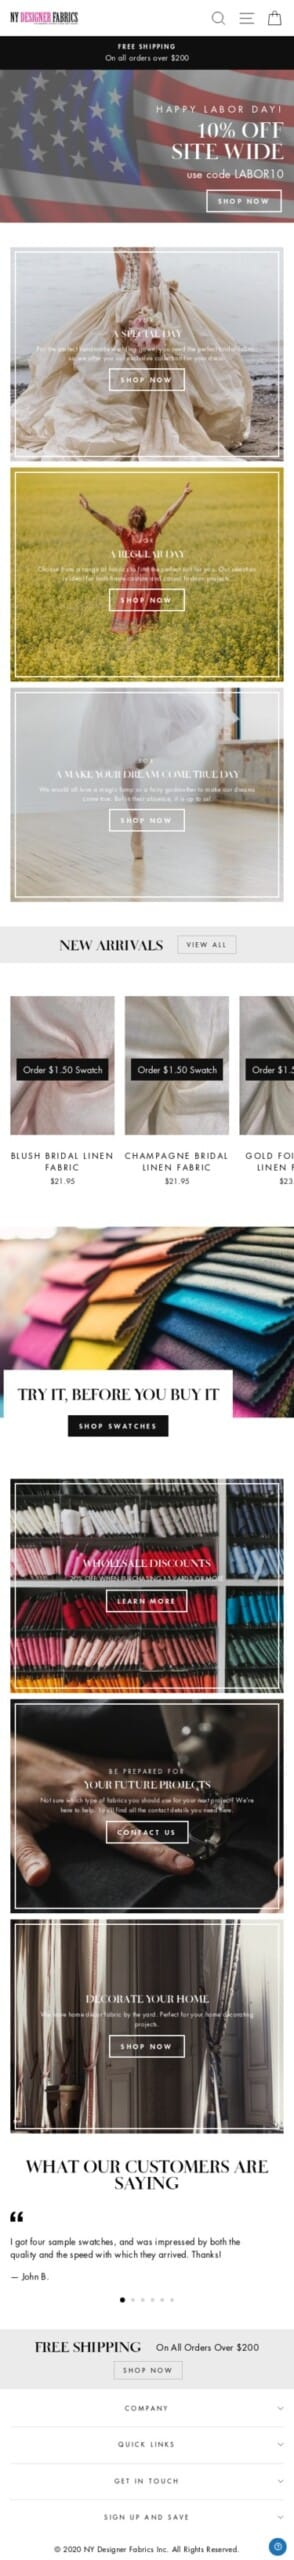 nydesignerfabrics.com Coupon